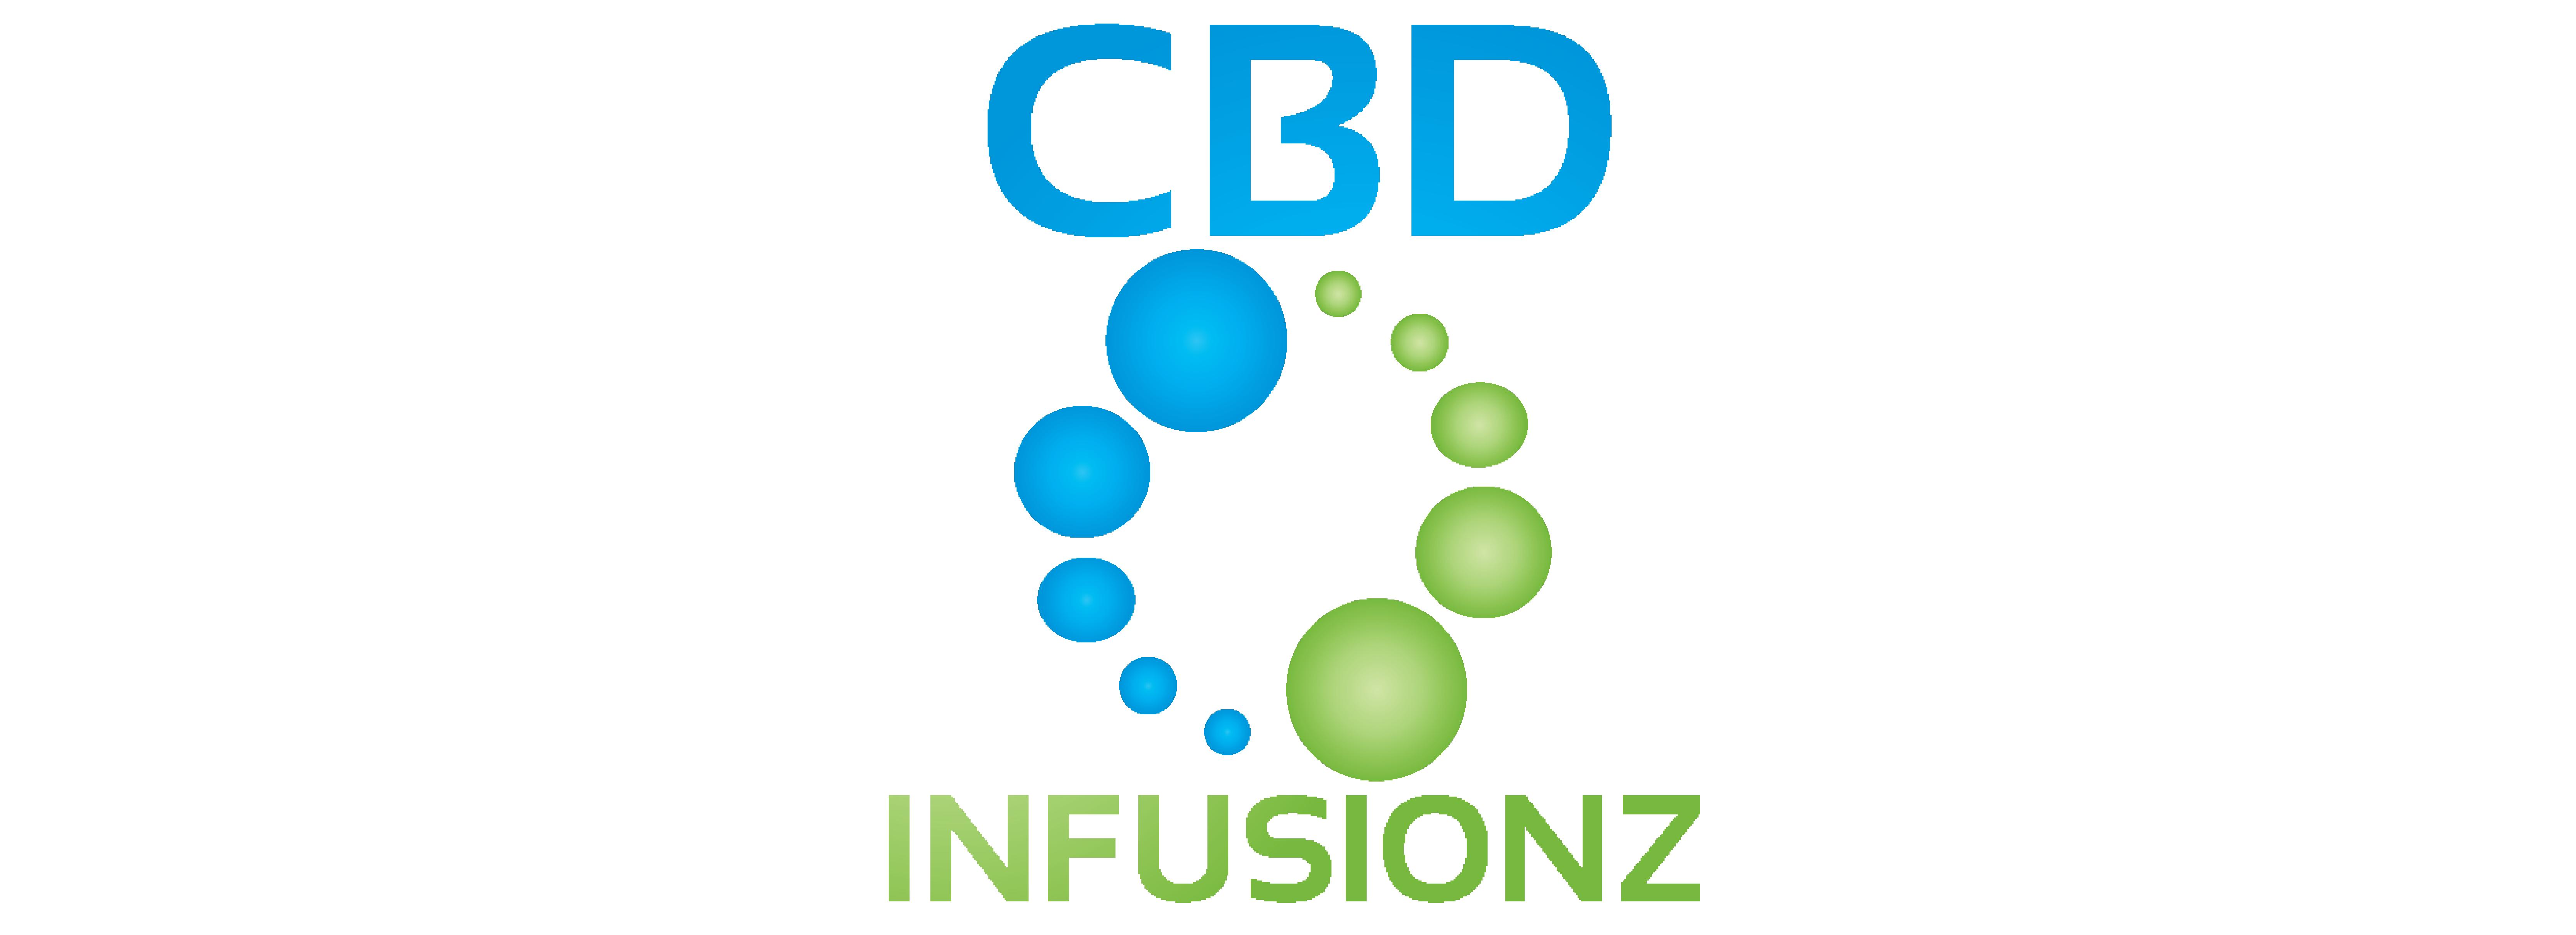 CBD Infusionz Logo